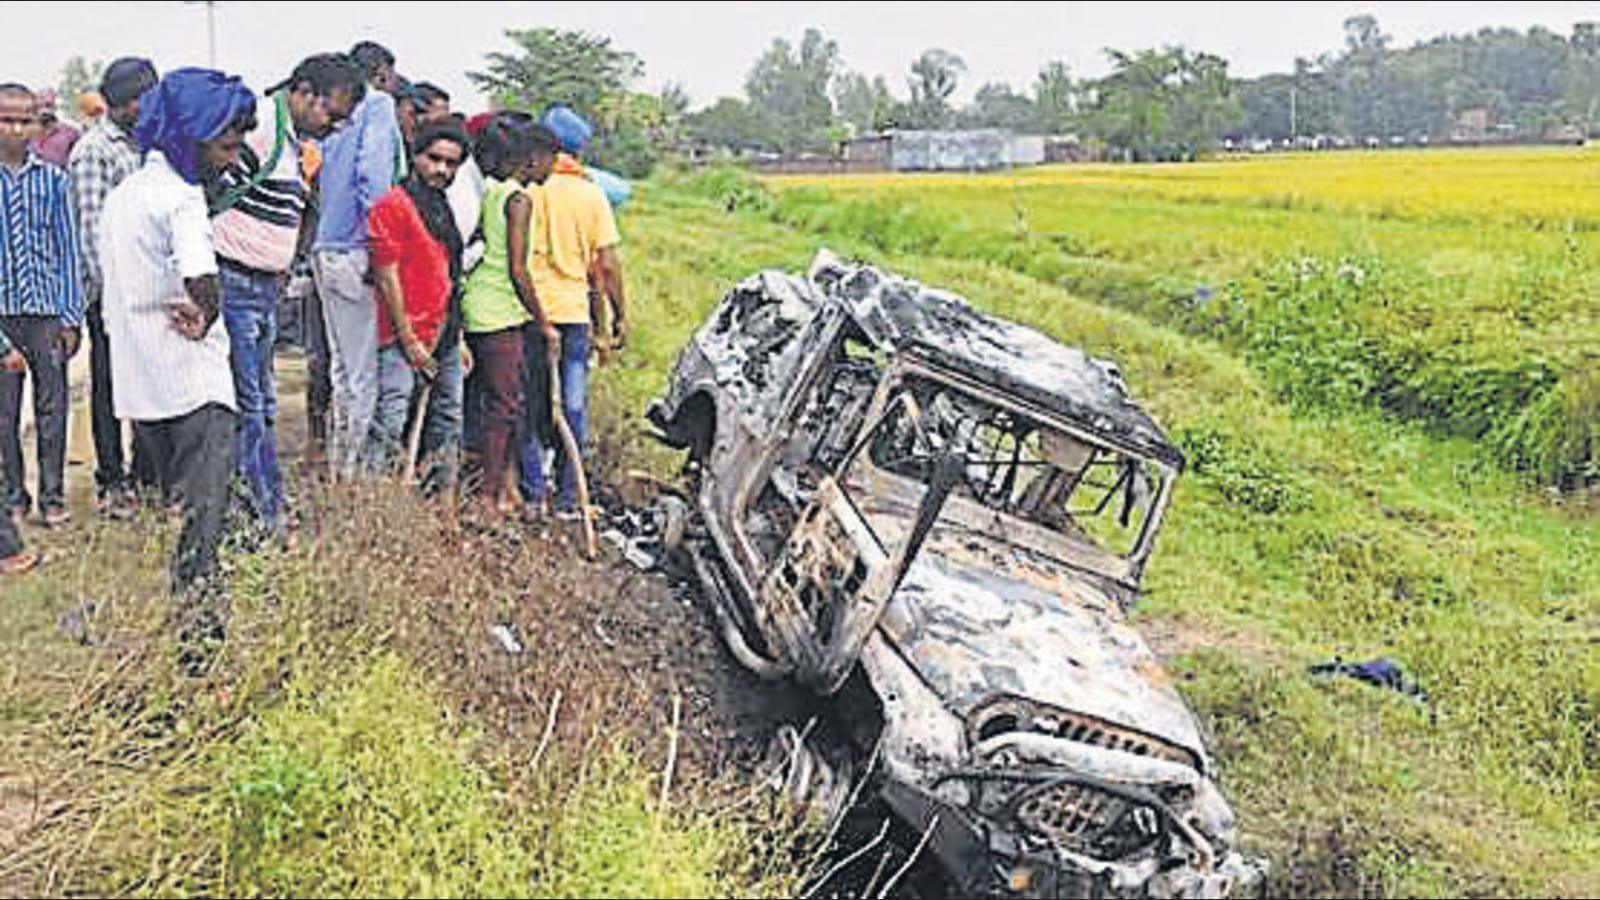 Lakhimpur Kheri: Key witness yet to appear before investigators